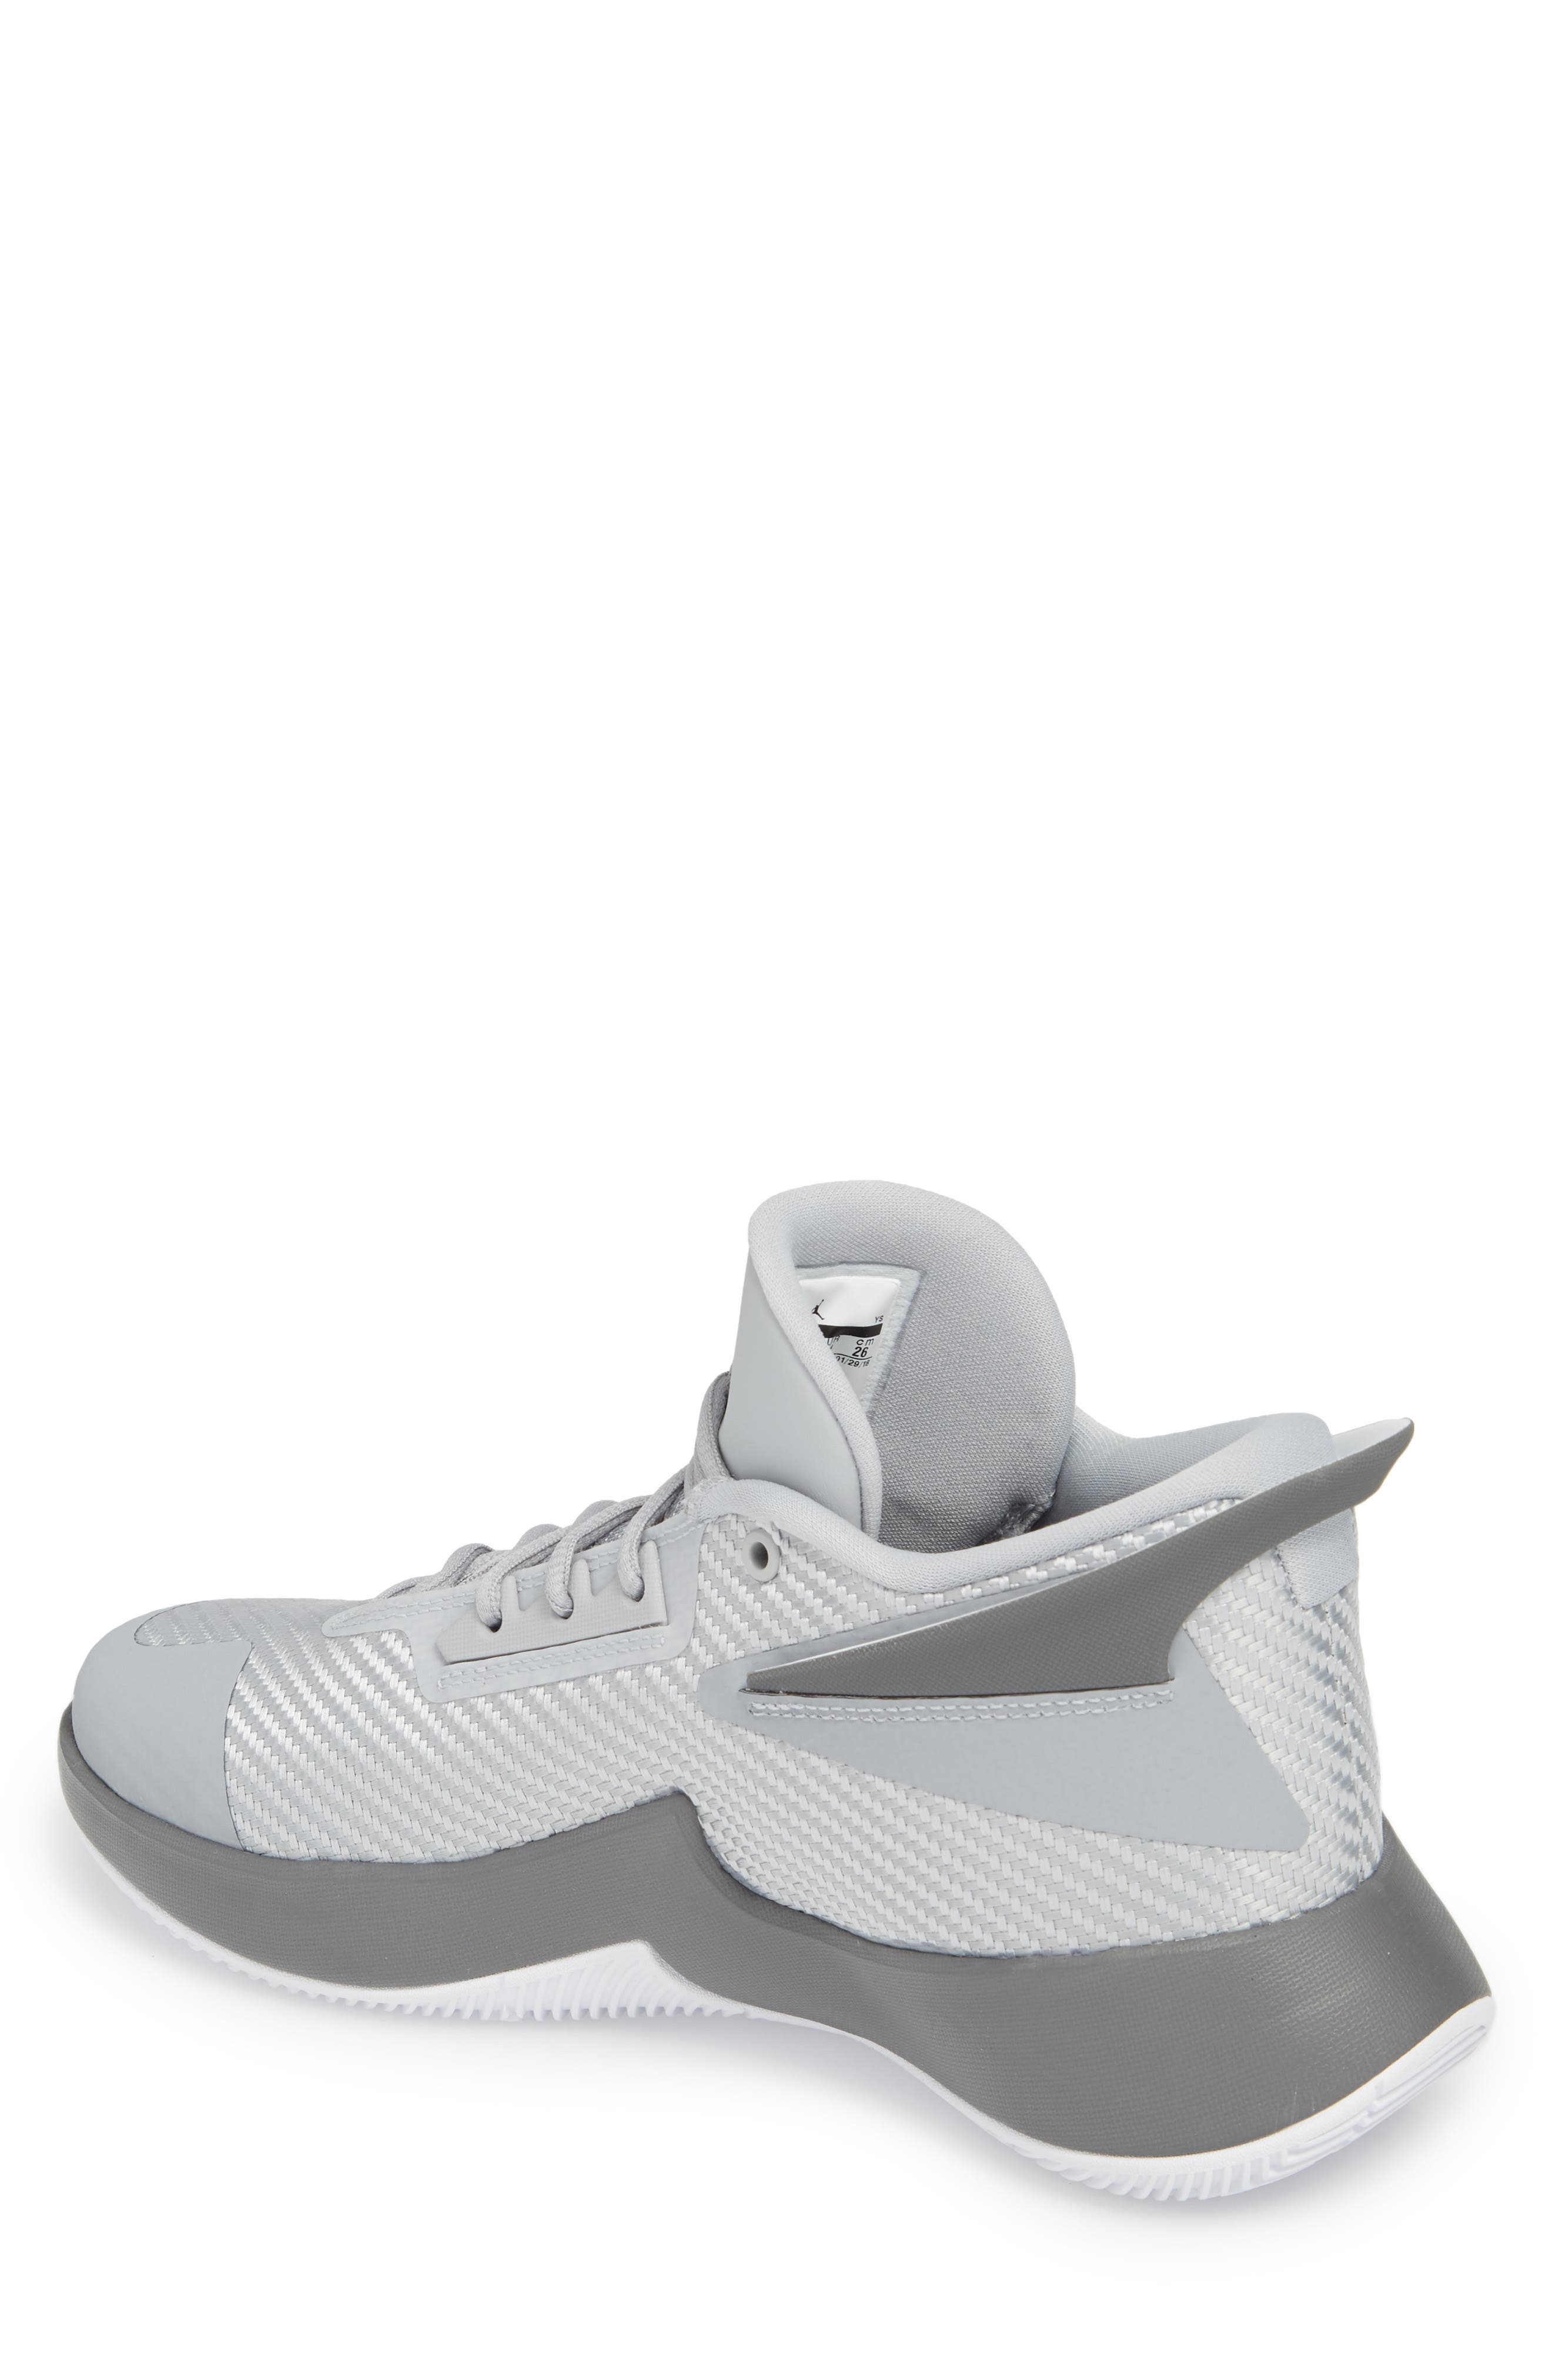 Jordan Fly Lockdown Sneaker,                             Alternate thumbnail 2, color,                             Wolf Grey/ White/ Dark Grey